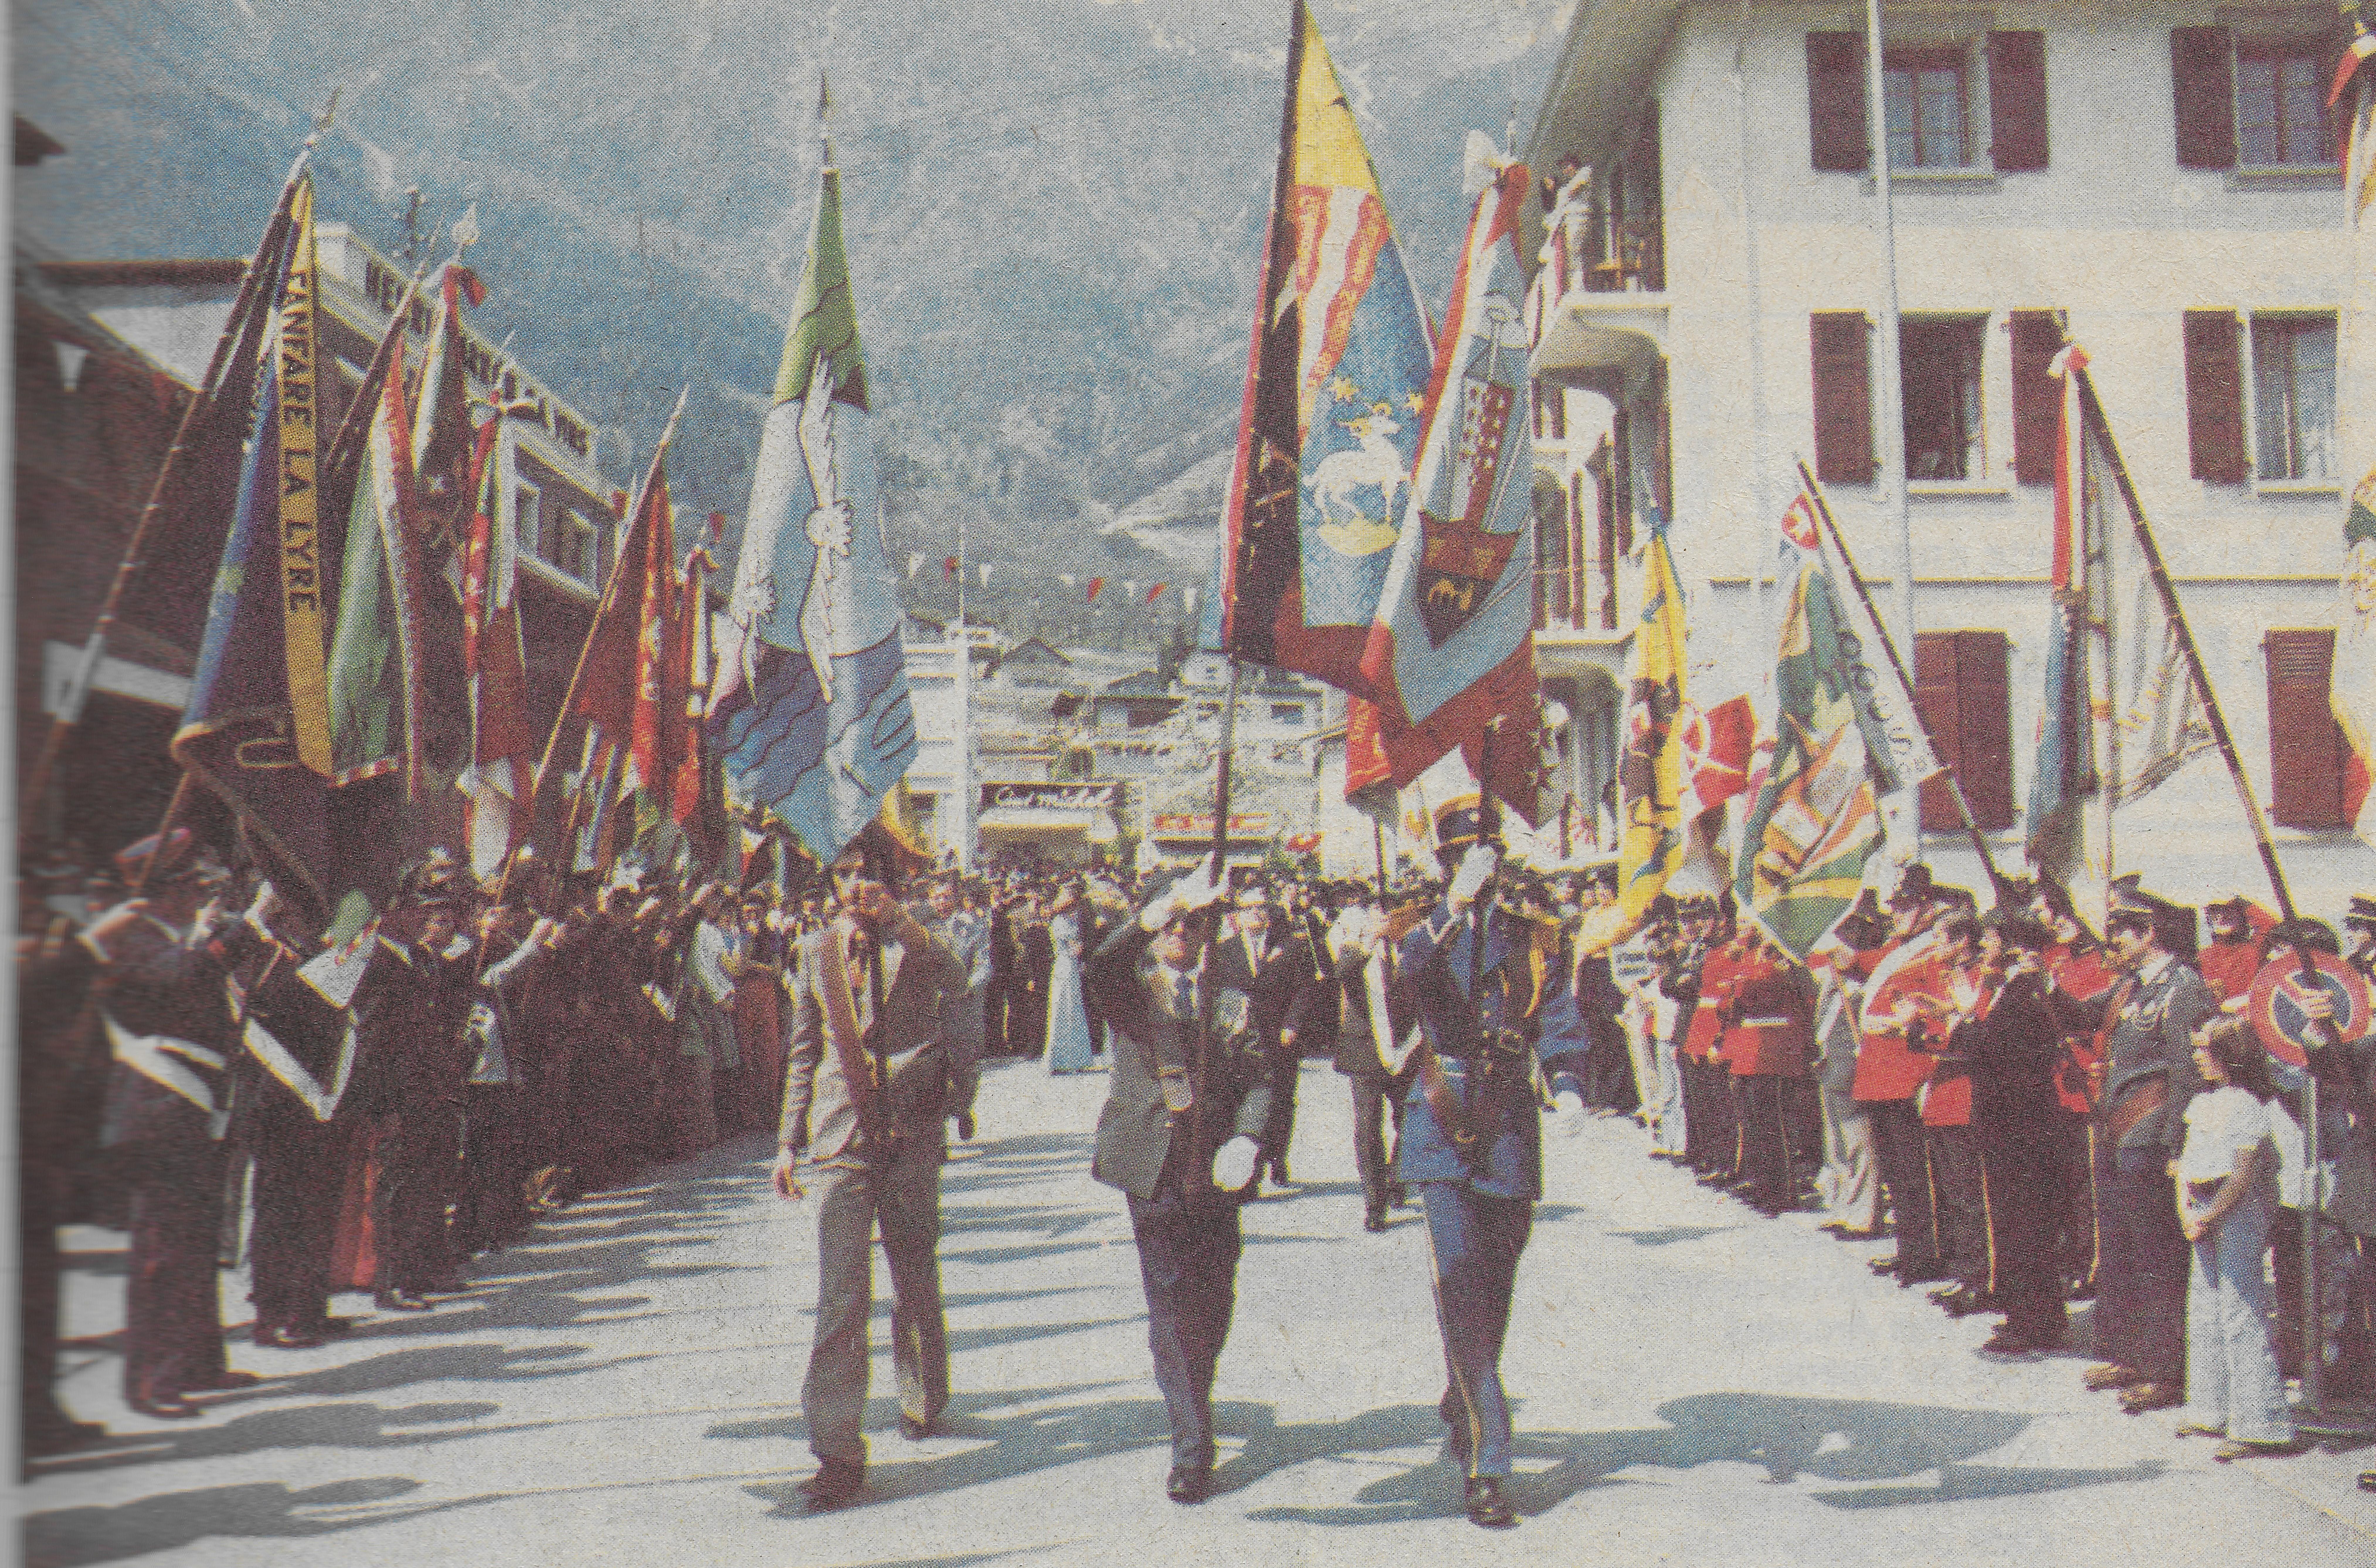 Inauguration du drapeau en 1975